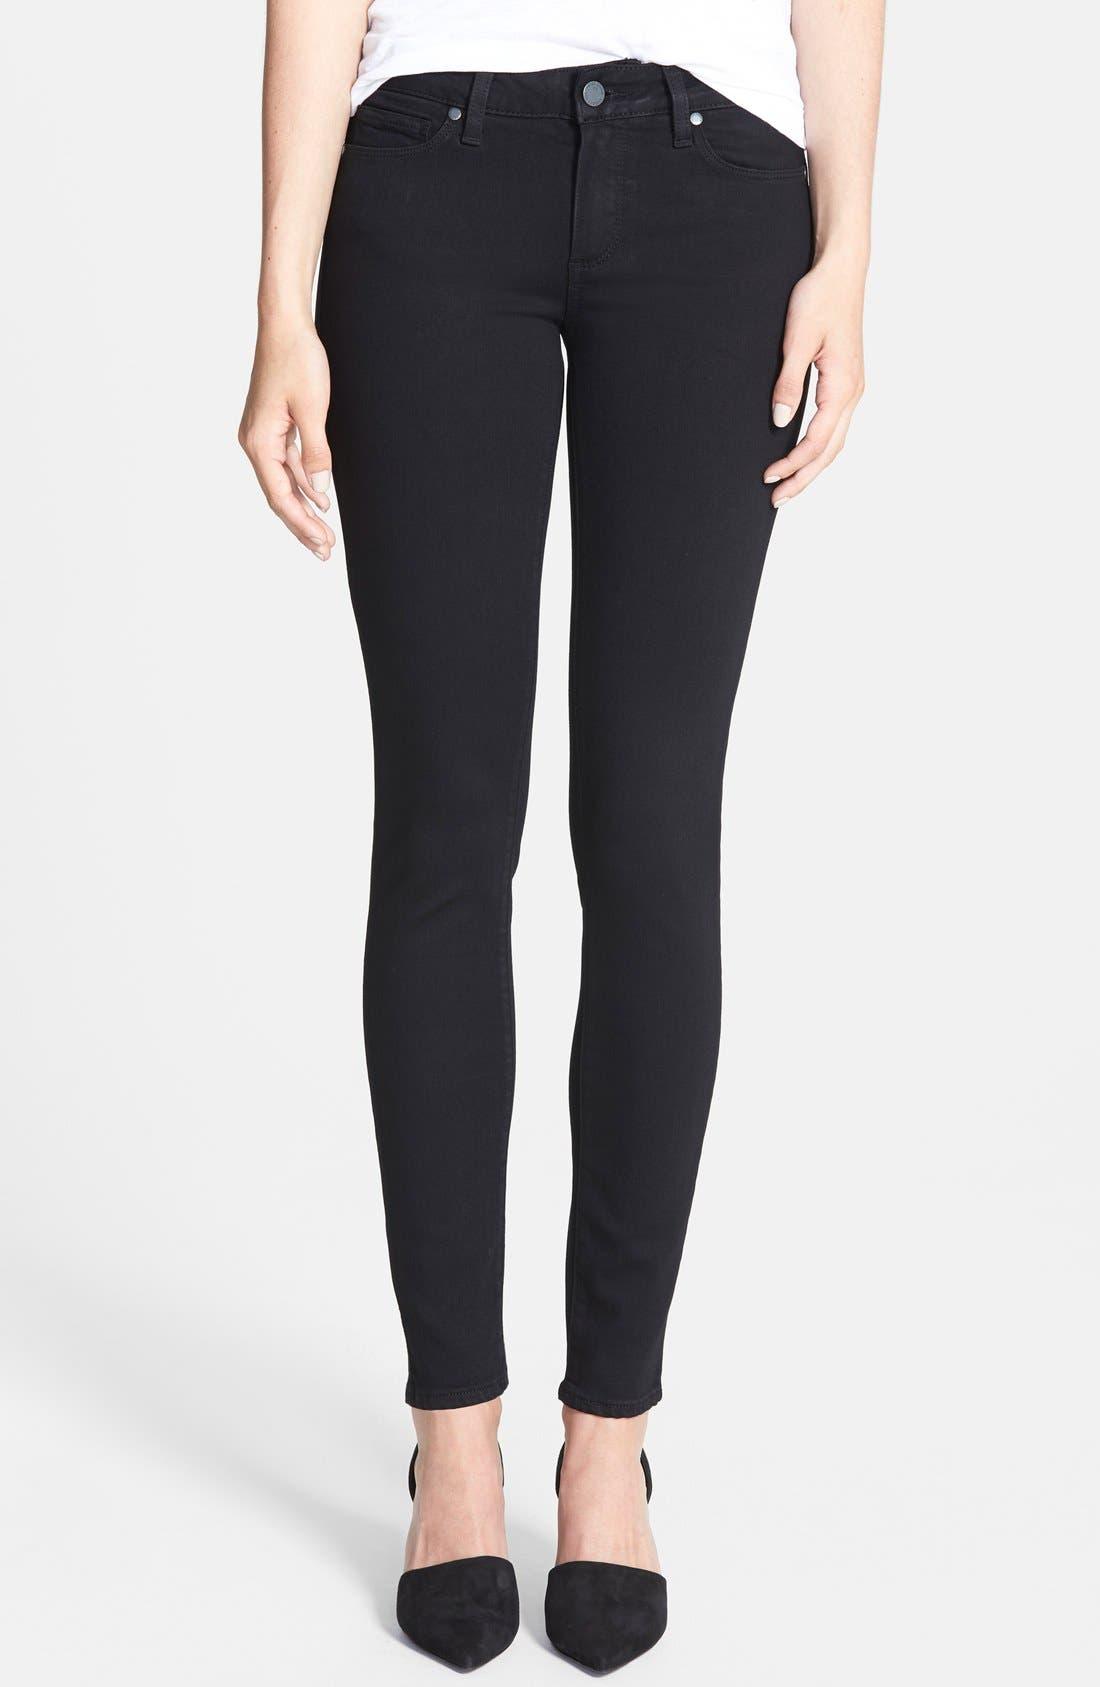 Main Image - PAIGE Transcend - Verdugo Ultra Skinny Jeans (Black Shadow)